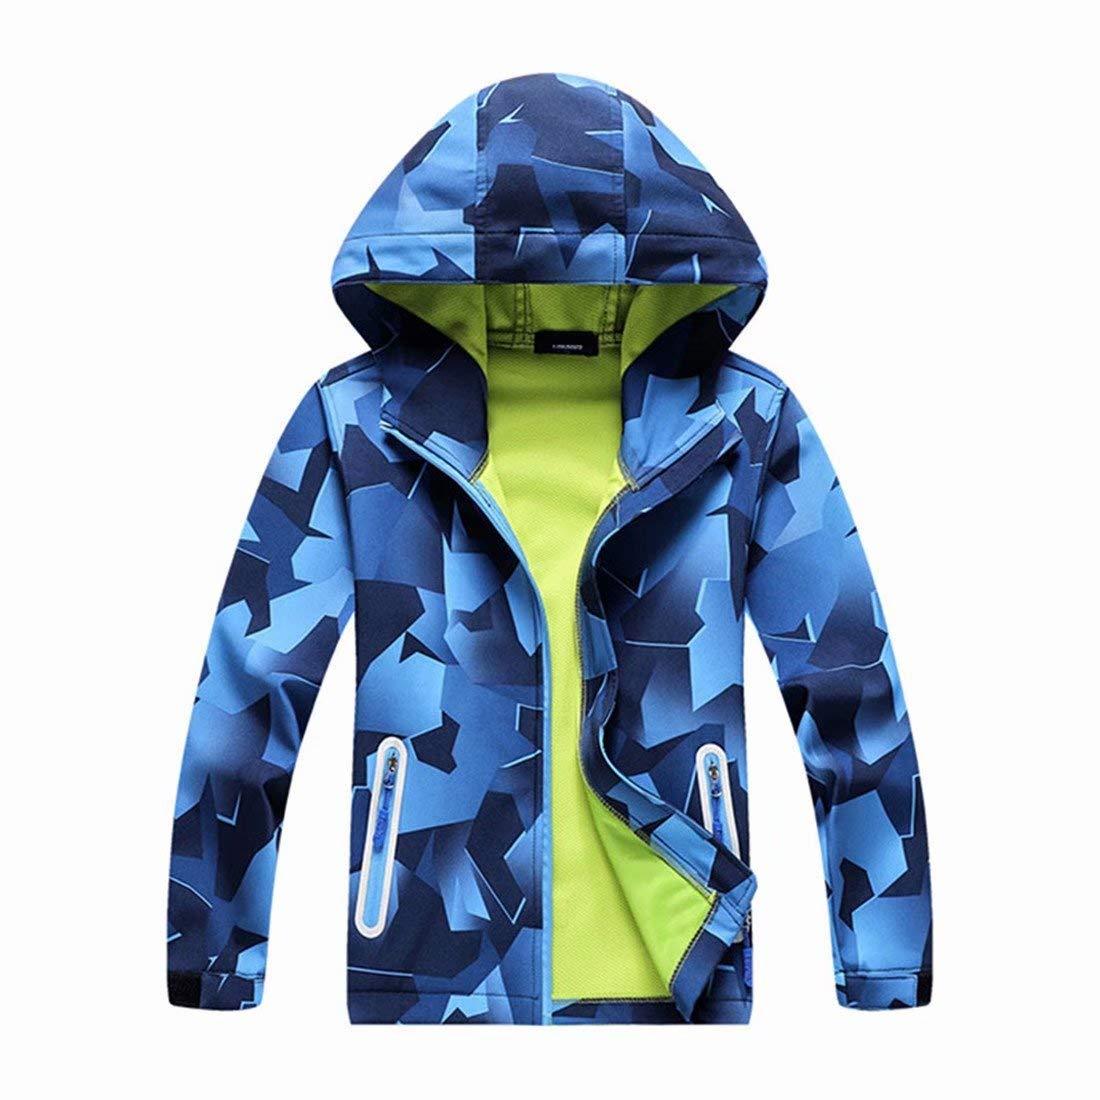 OLEK Boys Rain Jackets Outdoor Waterproof Windproof Jacket Raincoat Light Windbreaker for Camping Hiking Running by OLEK